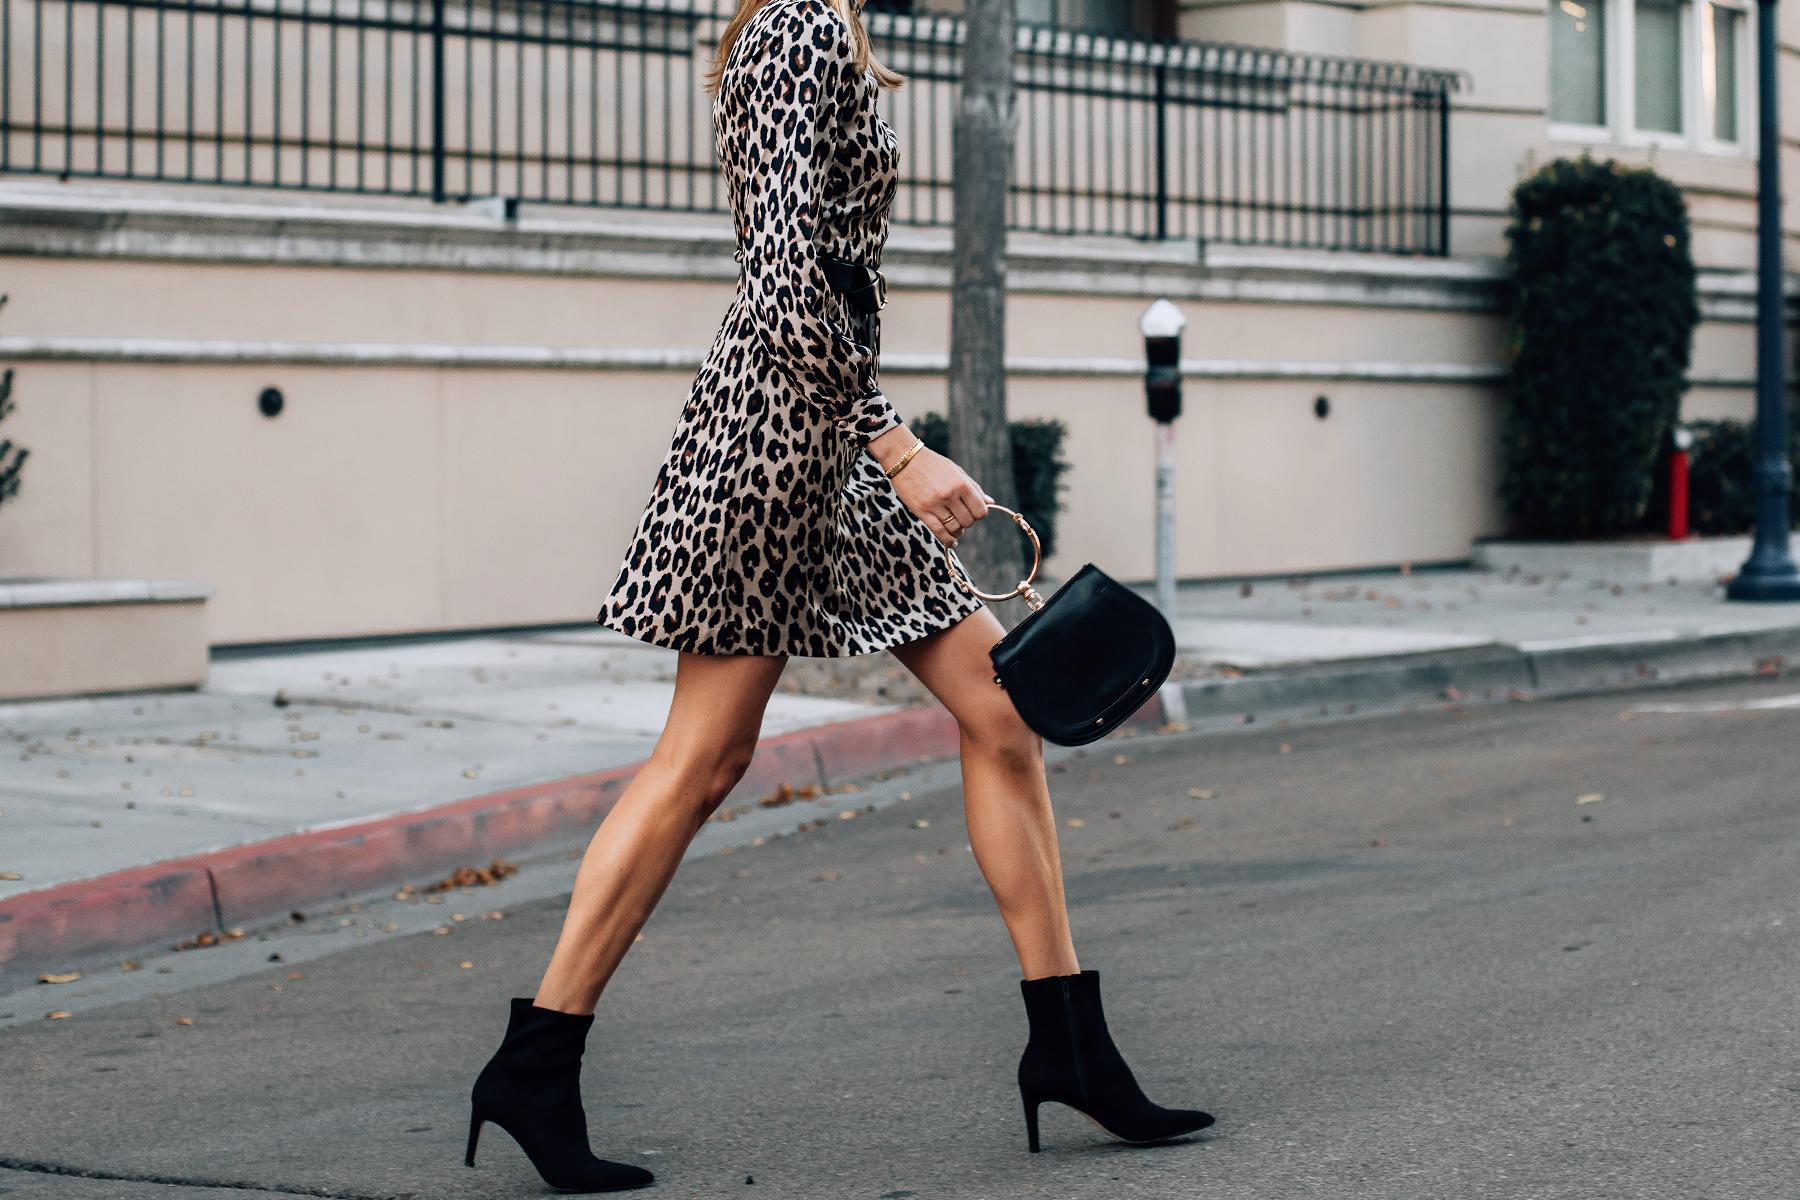 Woman Wearing Ann Taylor Leopard Dress Black Ankle Booties Fashion Jackson San Diego Fashion Blogger Street Style